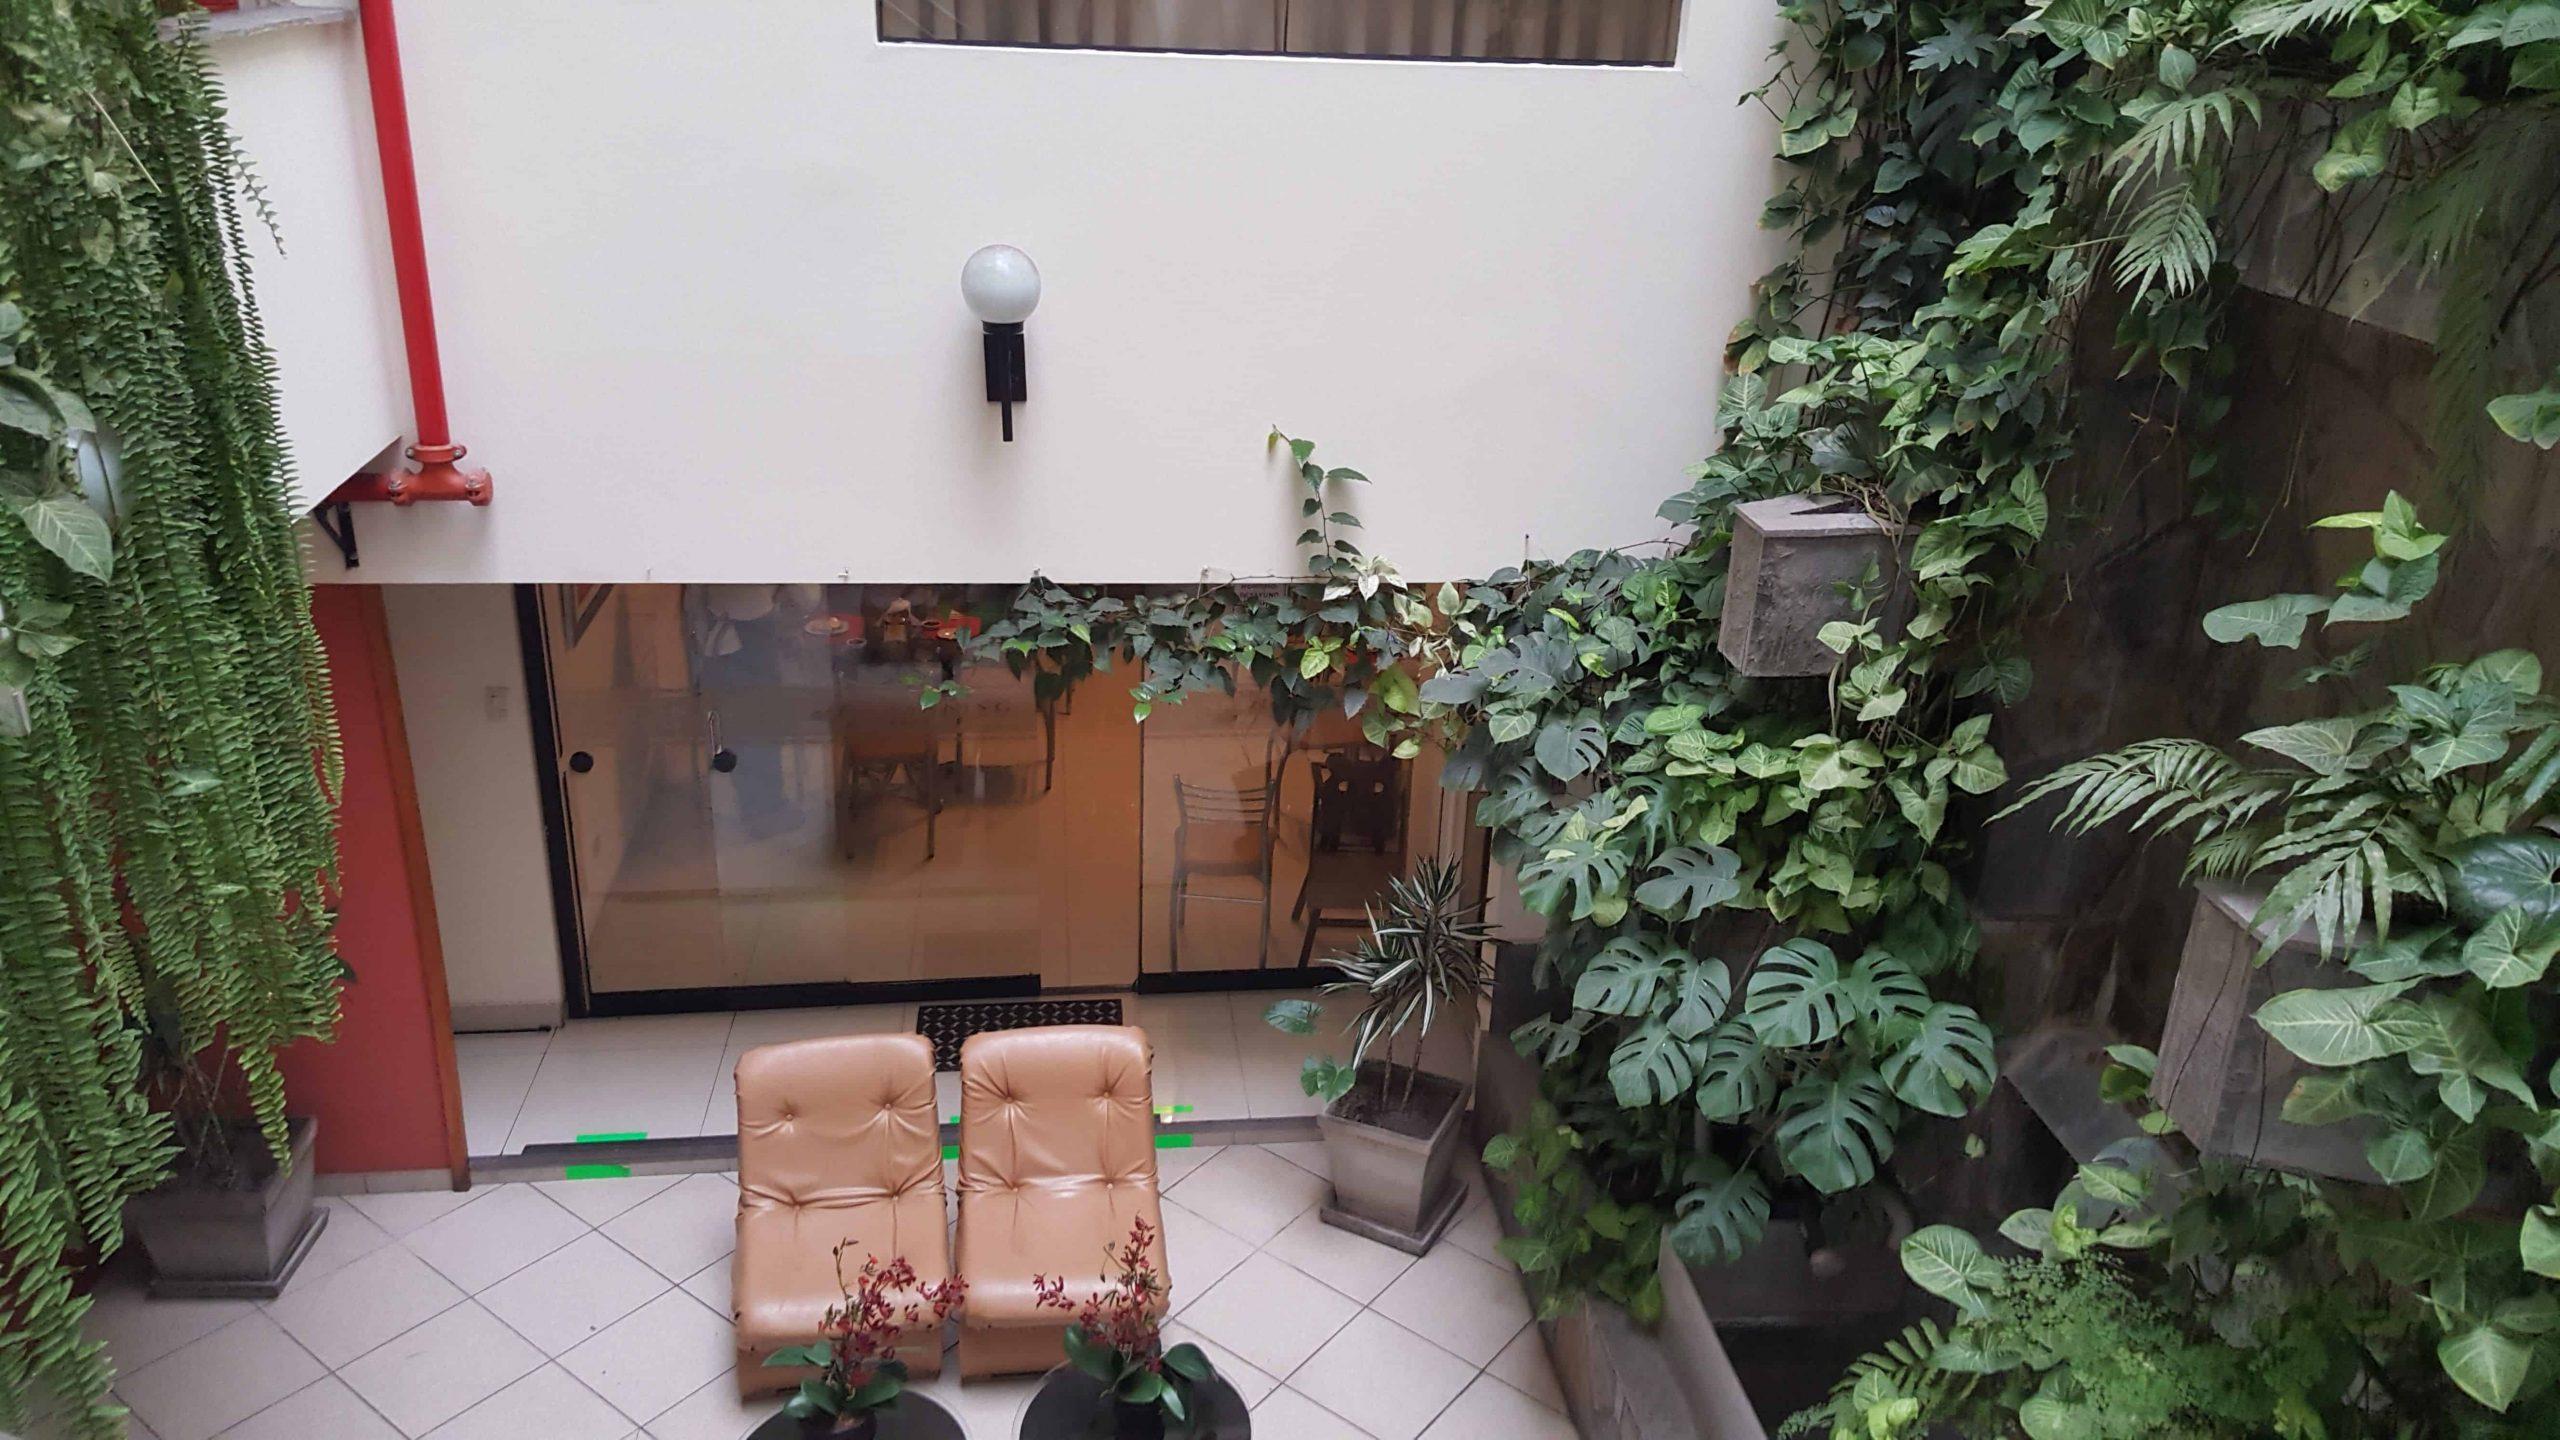 Hotel Review: Casa Fanning Apart Hotel (Lima, Peru)